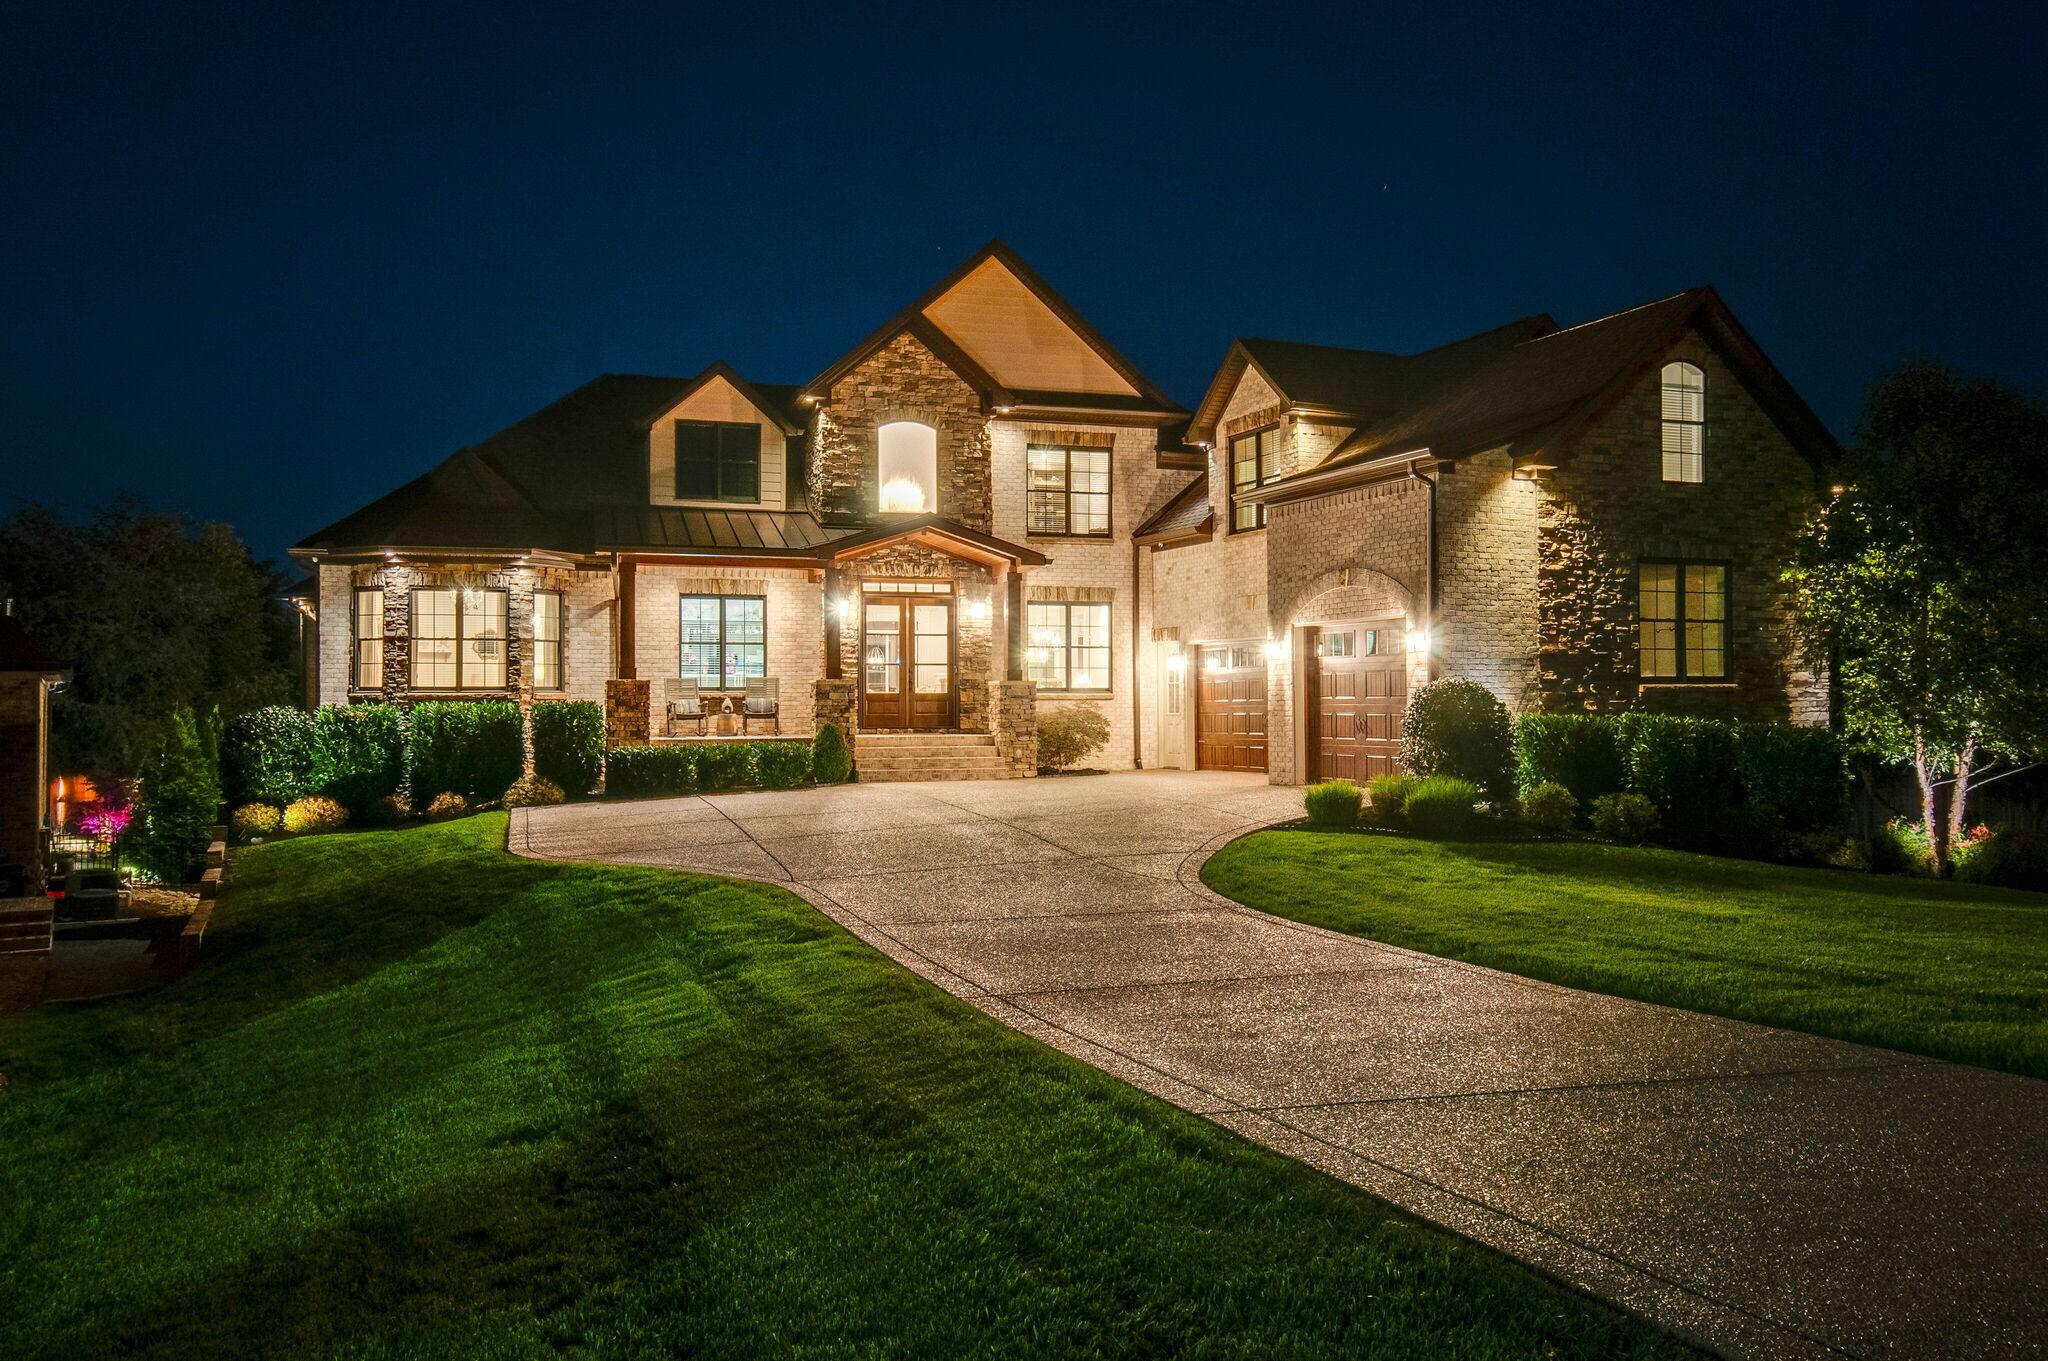 1098 Albatross Way Property Photo - Gallatin, TN real estate listing